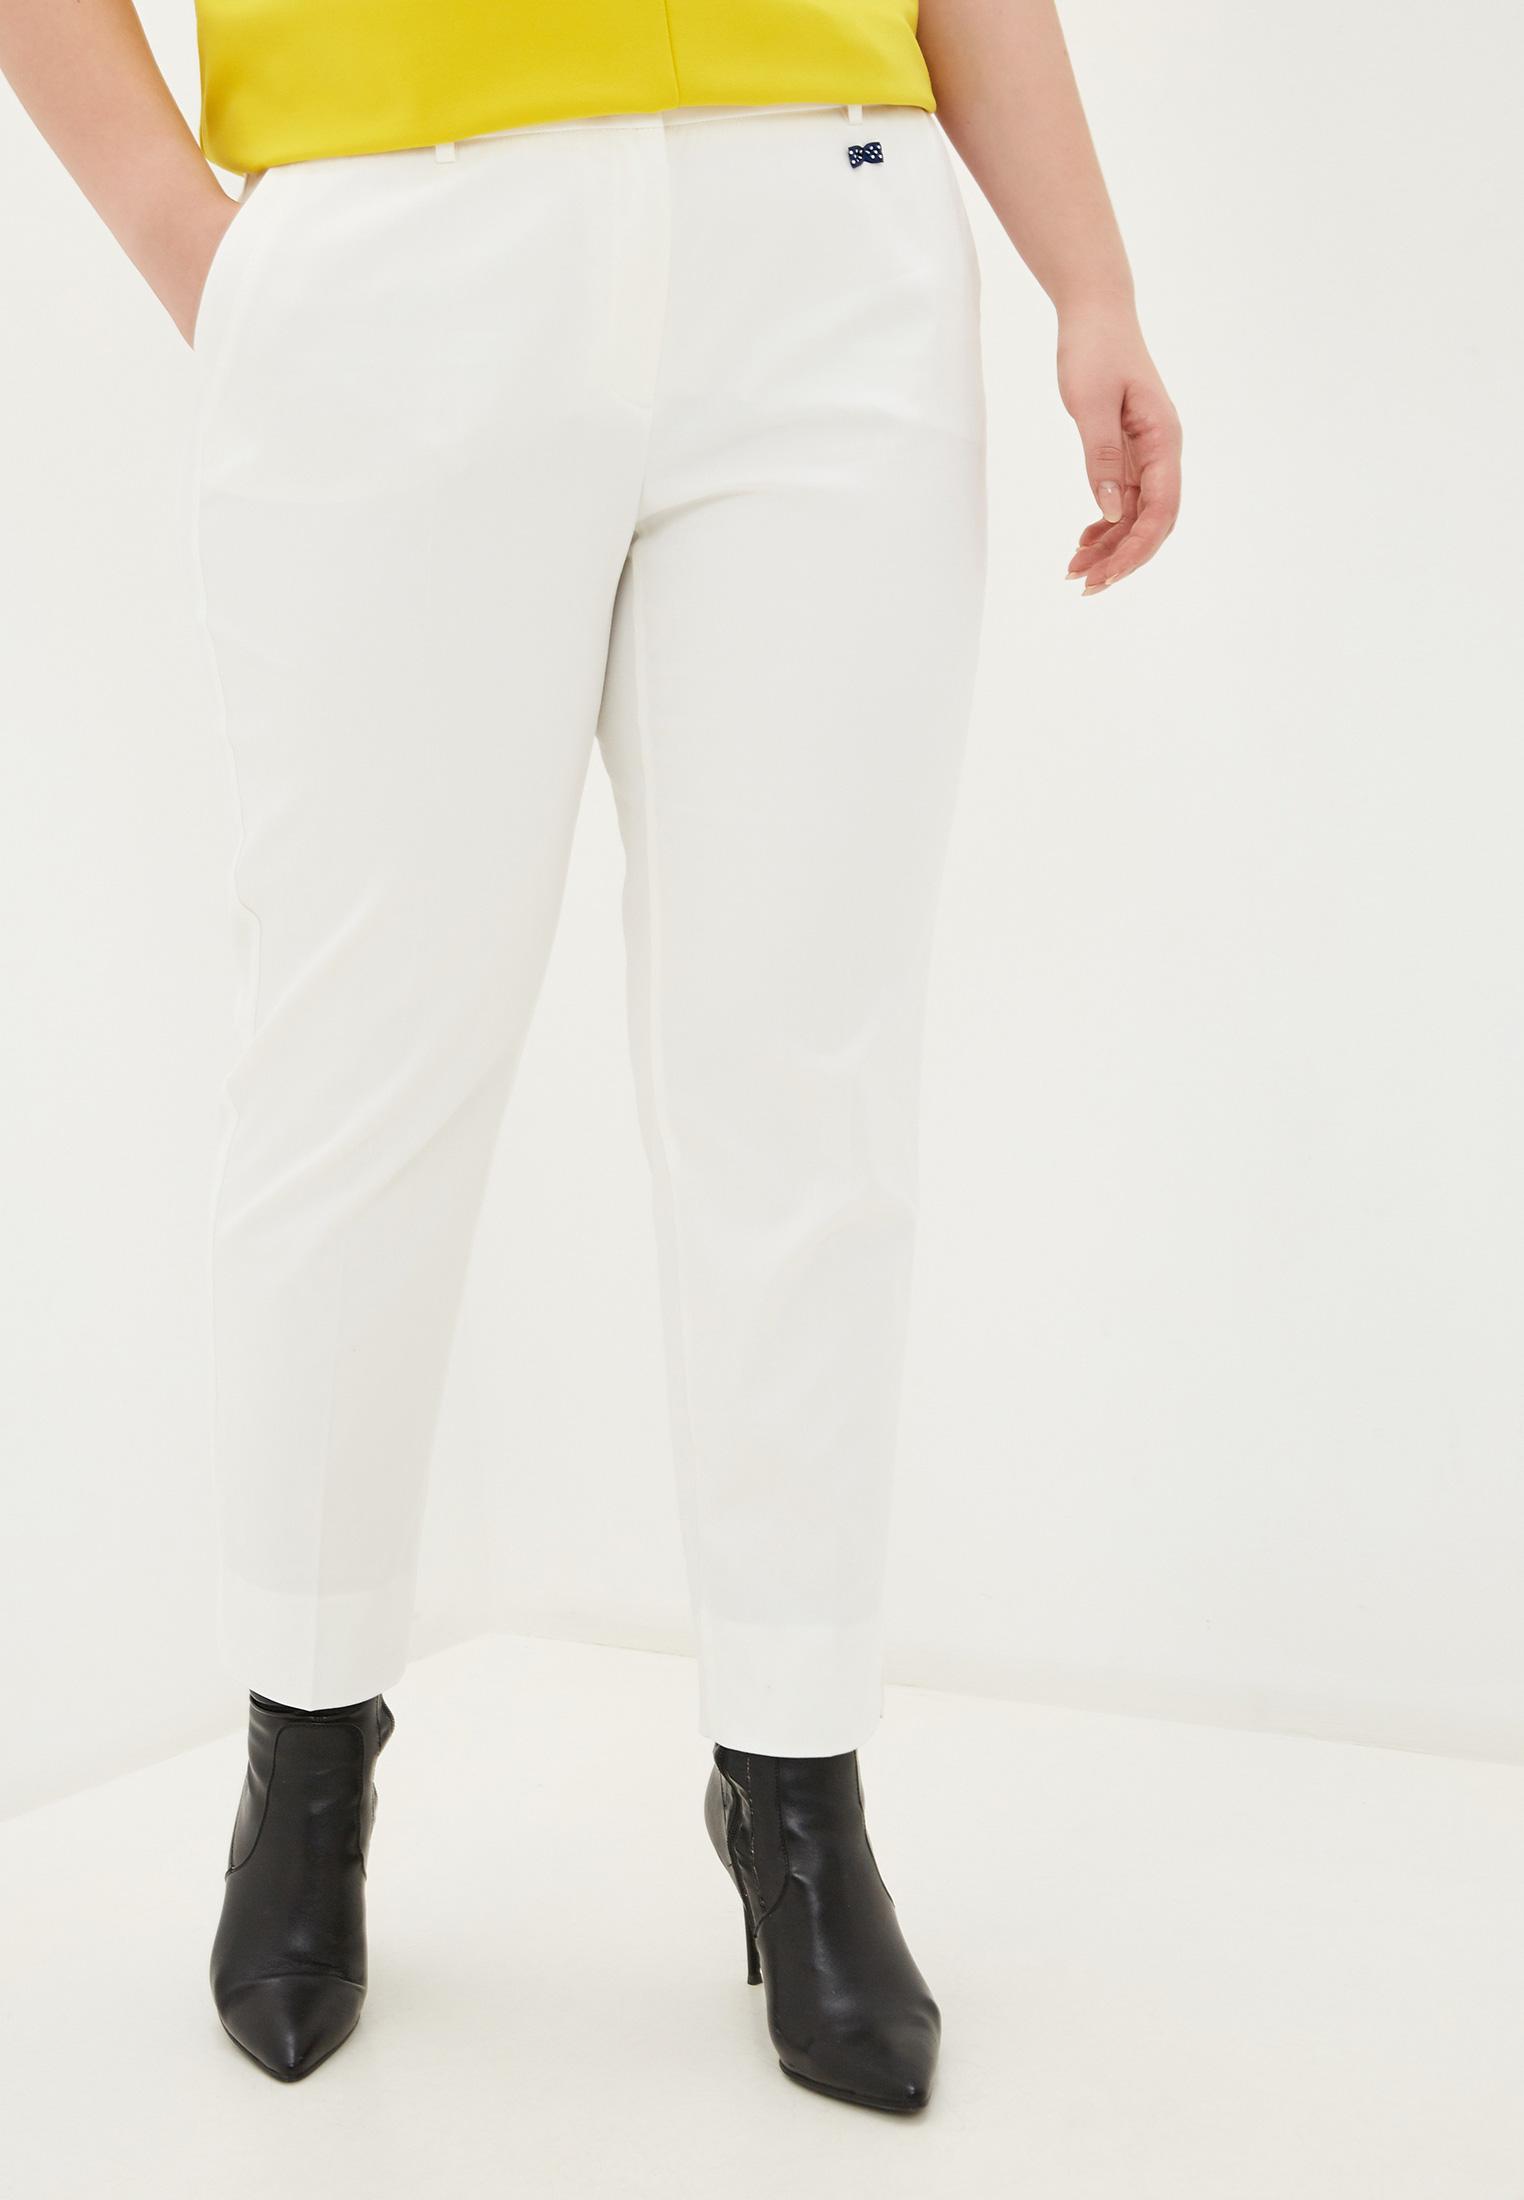 Женские зауженные брюки Samoon by Gerry Weber 820203-27110